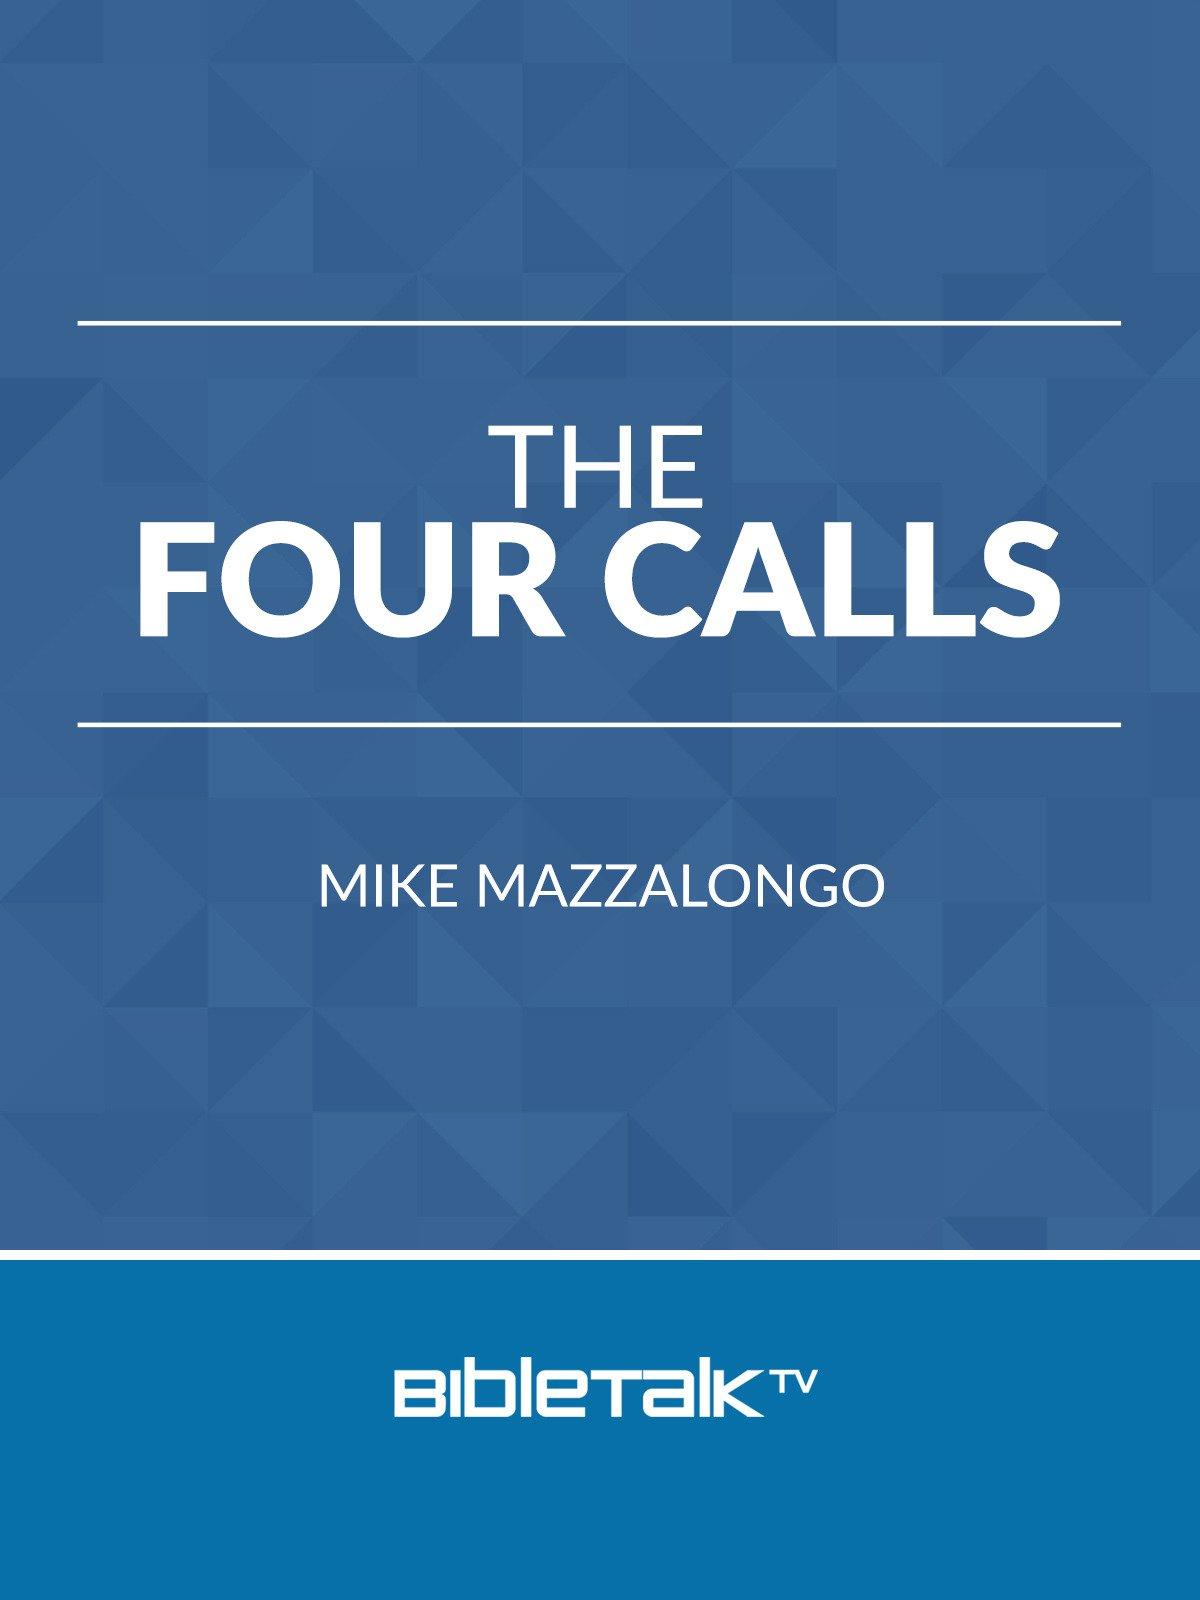 The Four Calls